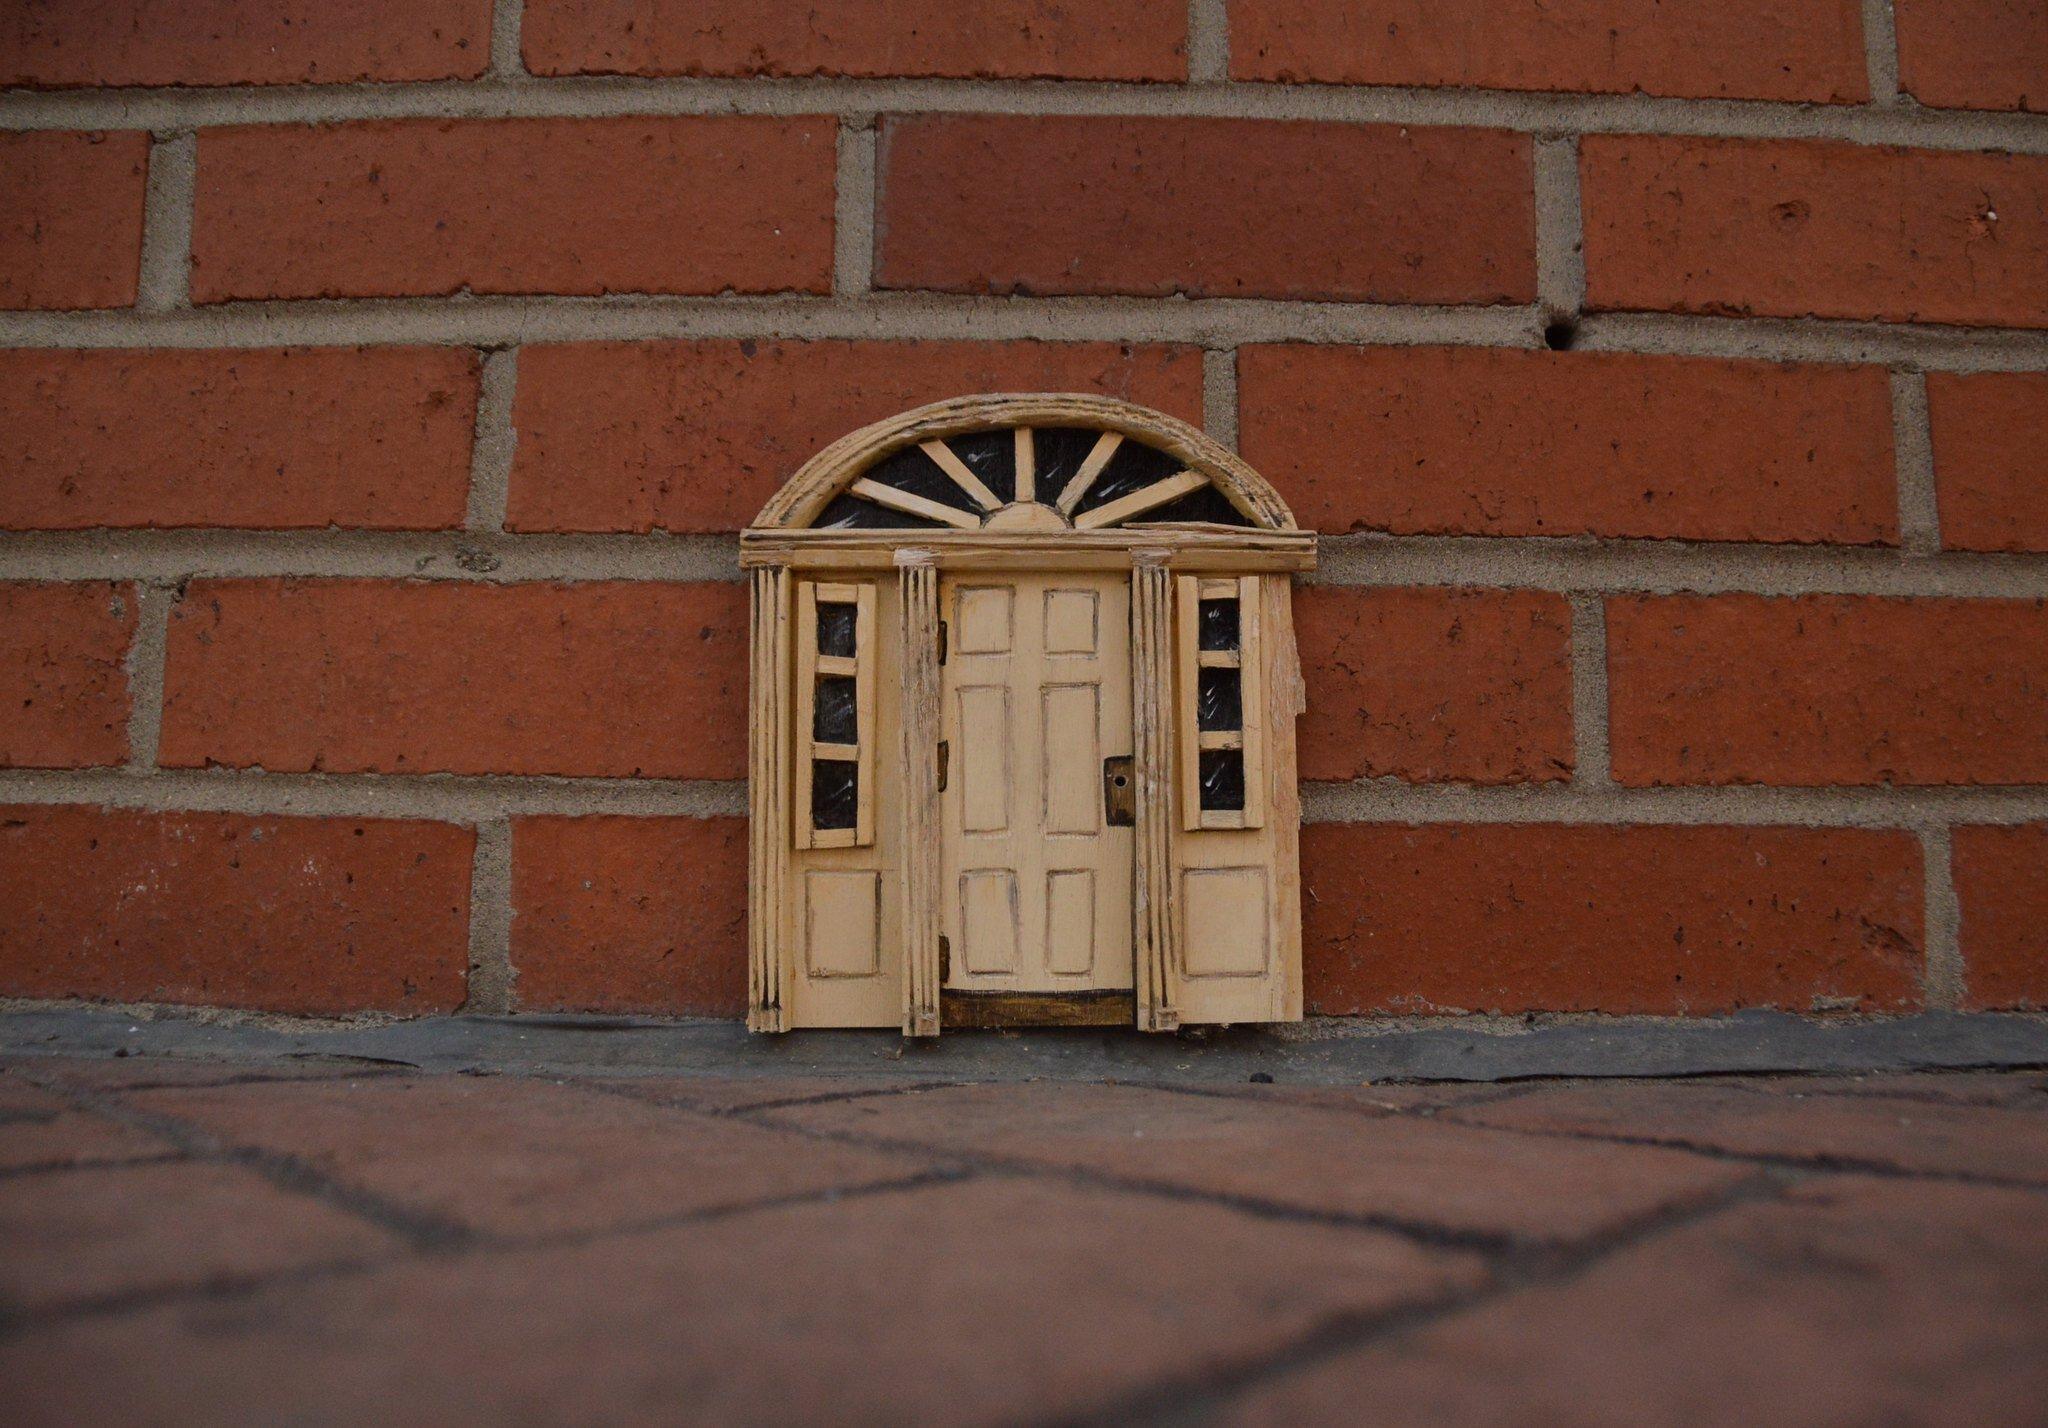 Tiny Door Nikon D3200 18-200mm f:3.5-5.6.jpg